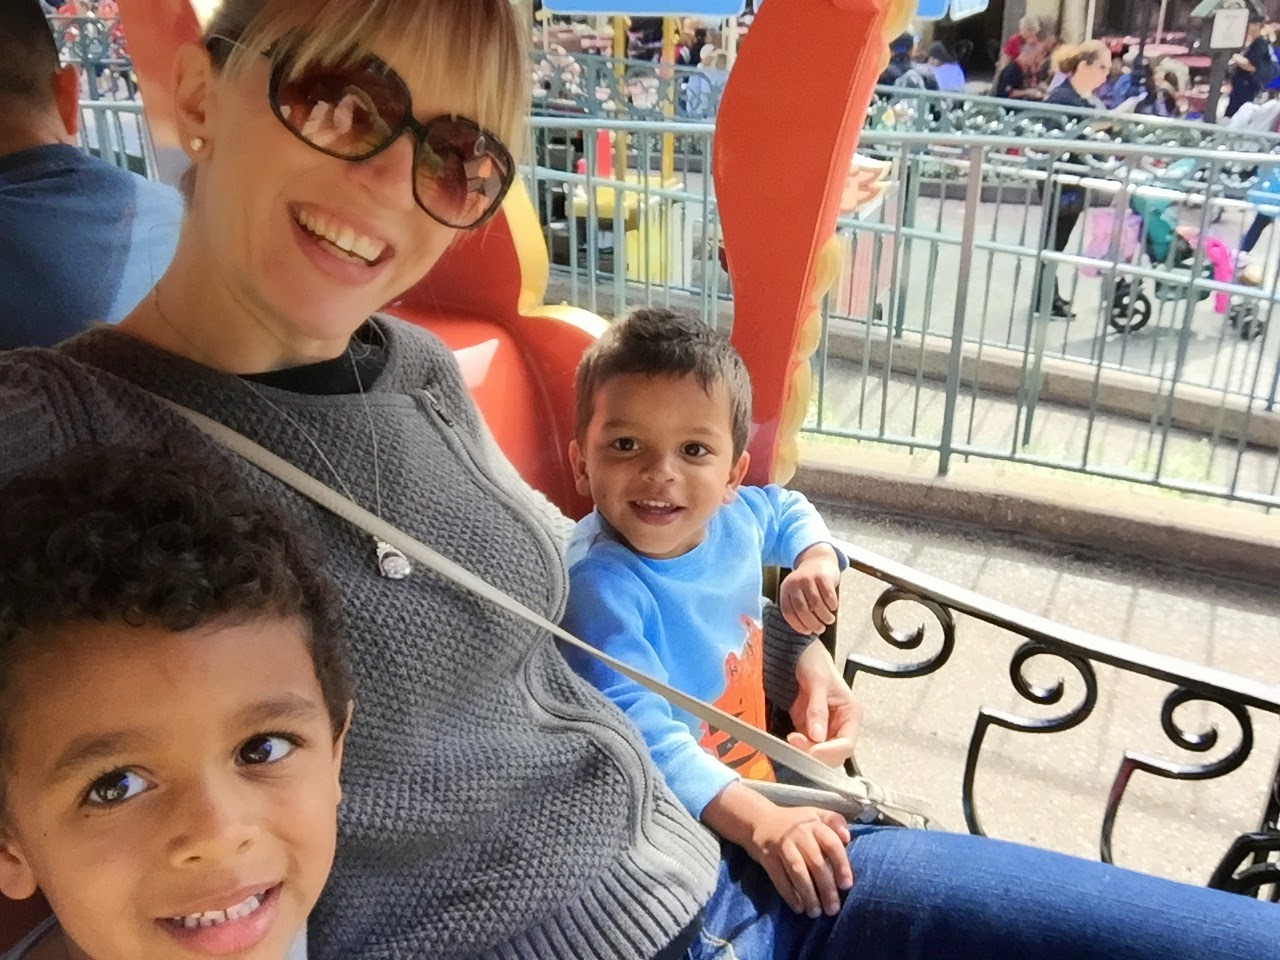 Disneyland Fun!